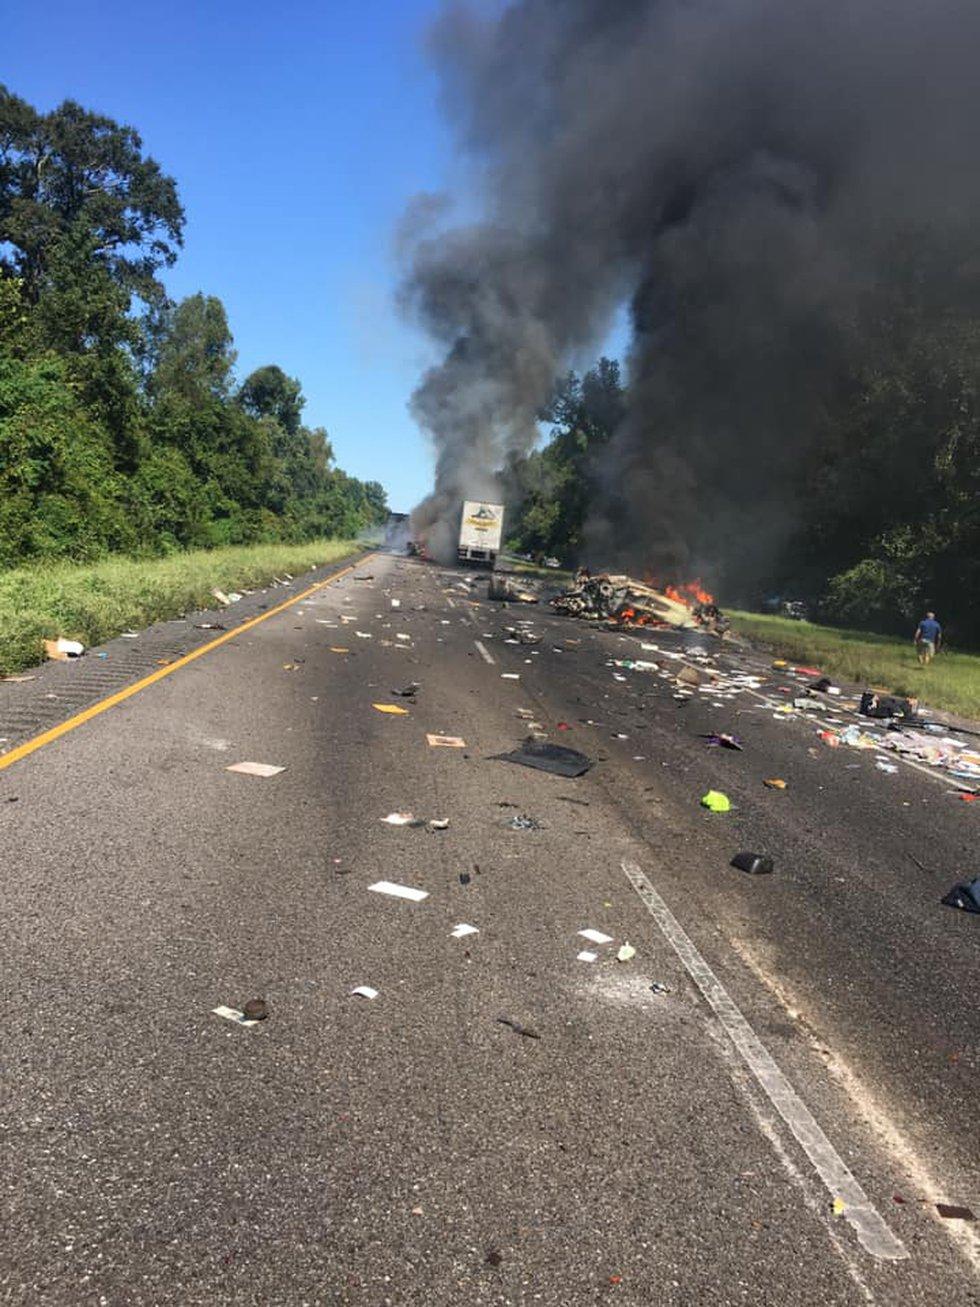 A fiery, multi-vehicle crash on I-10 near Port Allen, La. killed a man from Metairie, La., who...